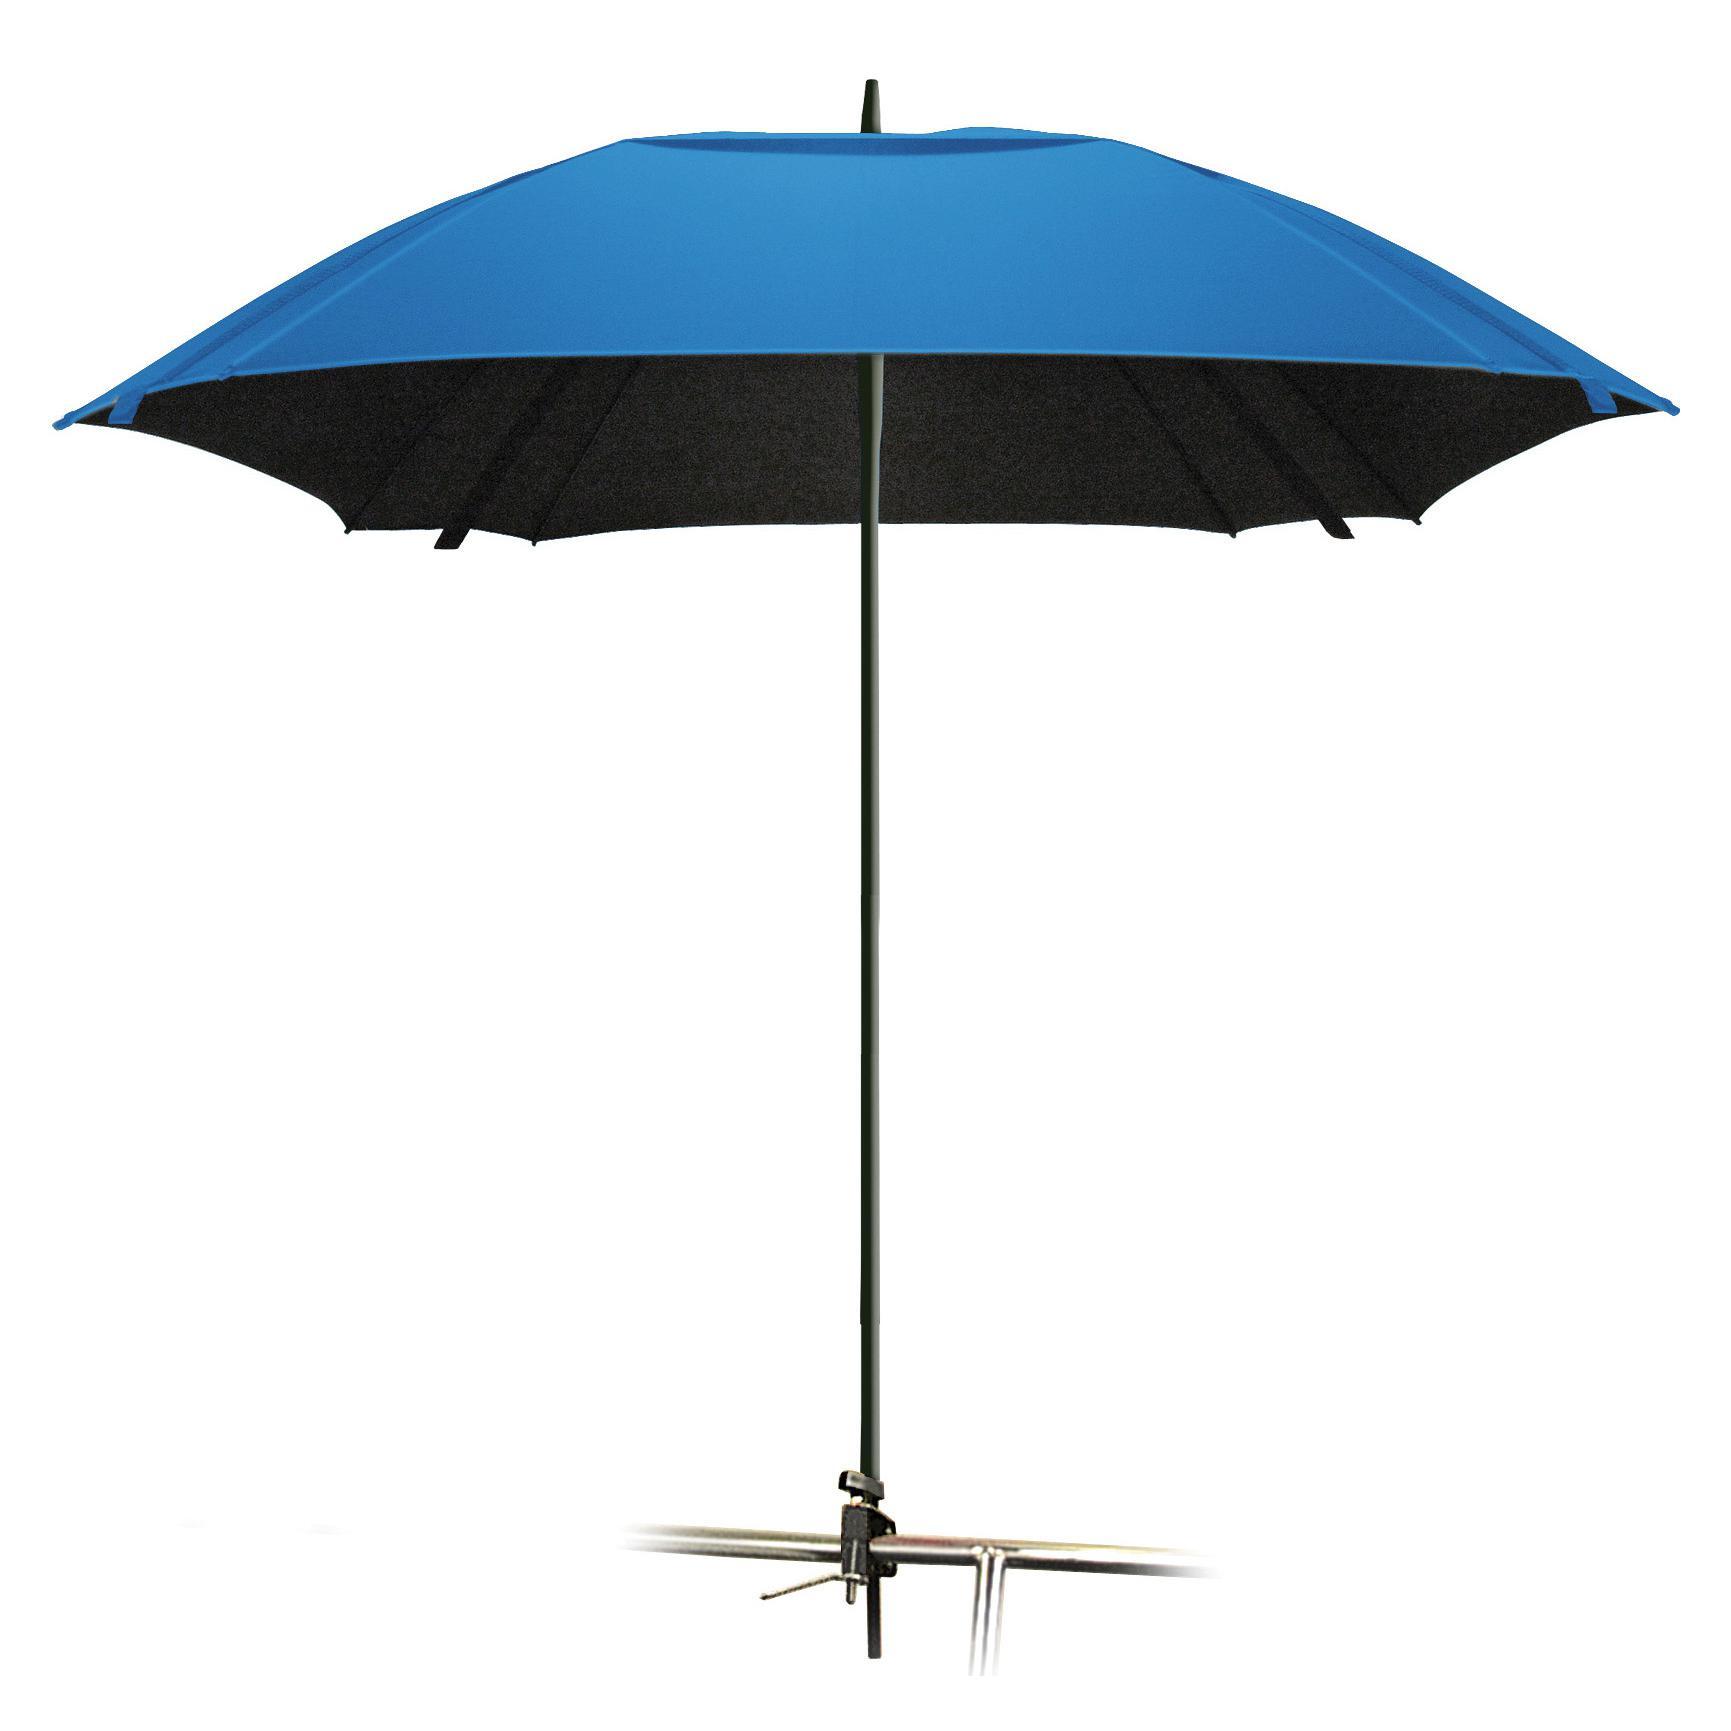 magma parasol de cockpit bleu magma parasols tauds. Black Bedroom Furniture Sets. Home Design Ideas